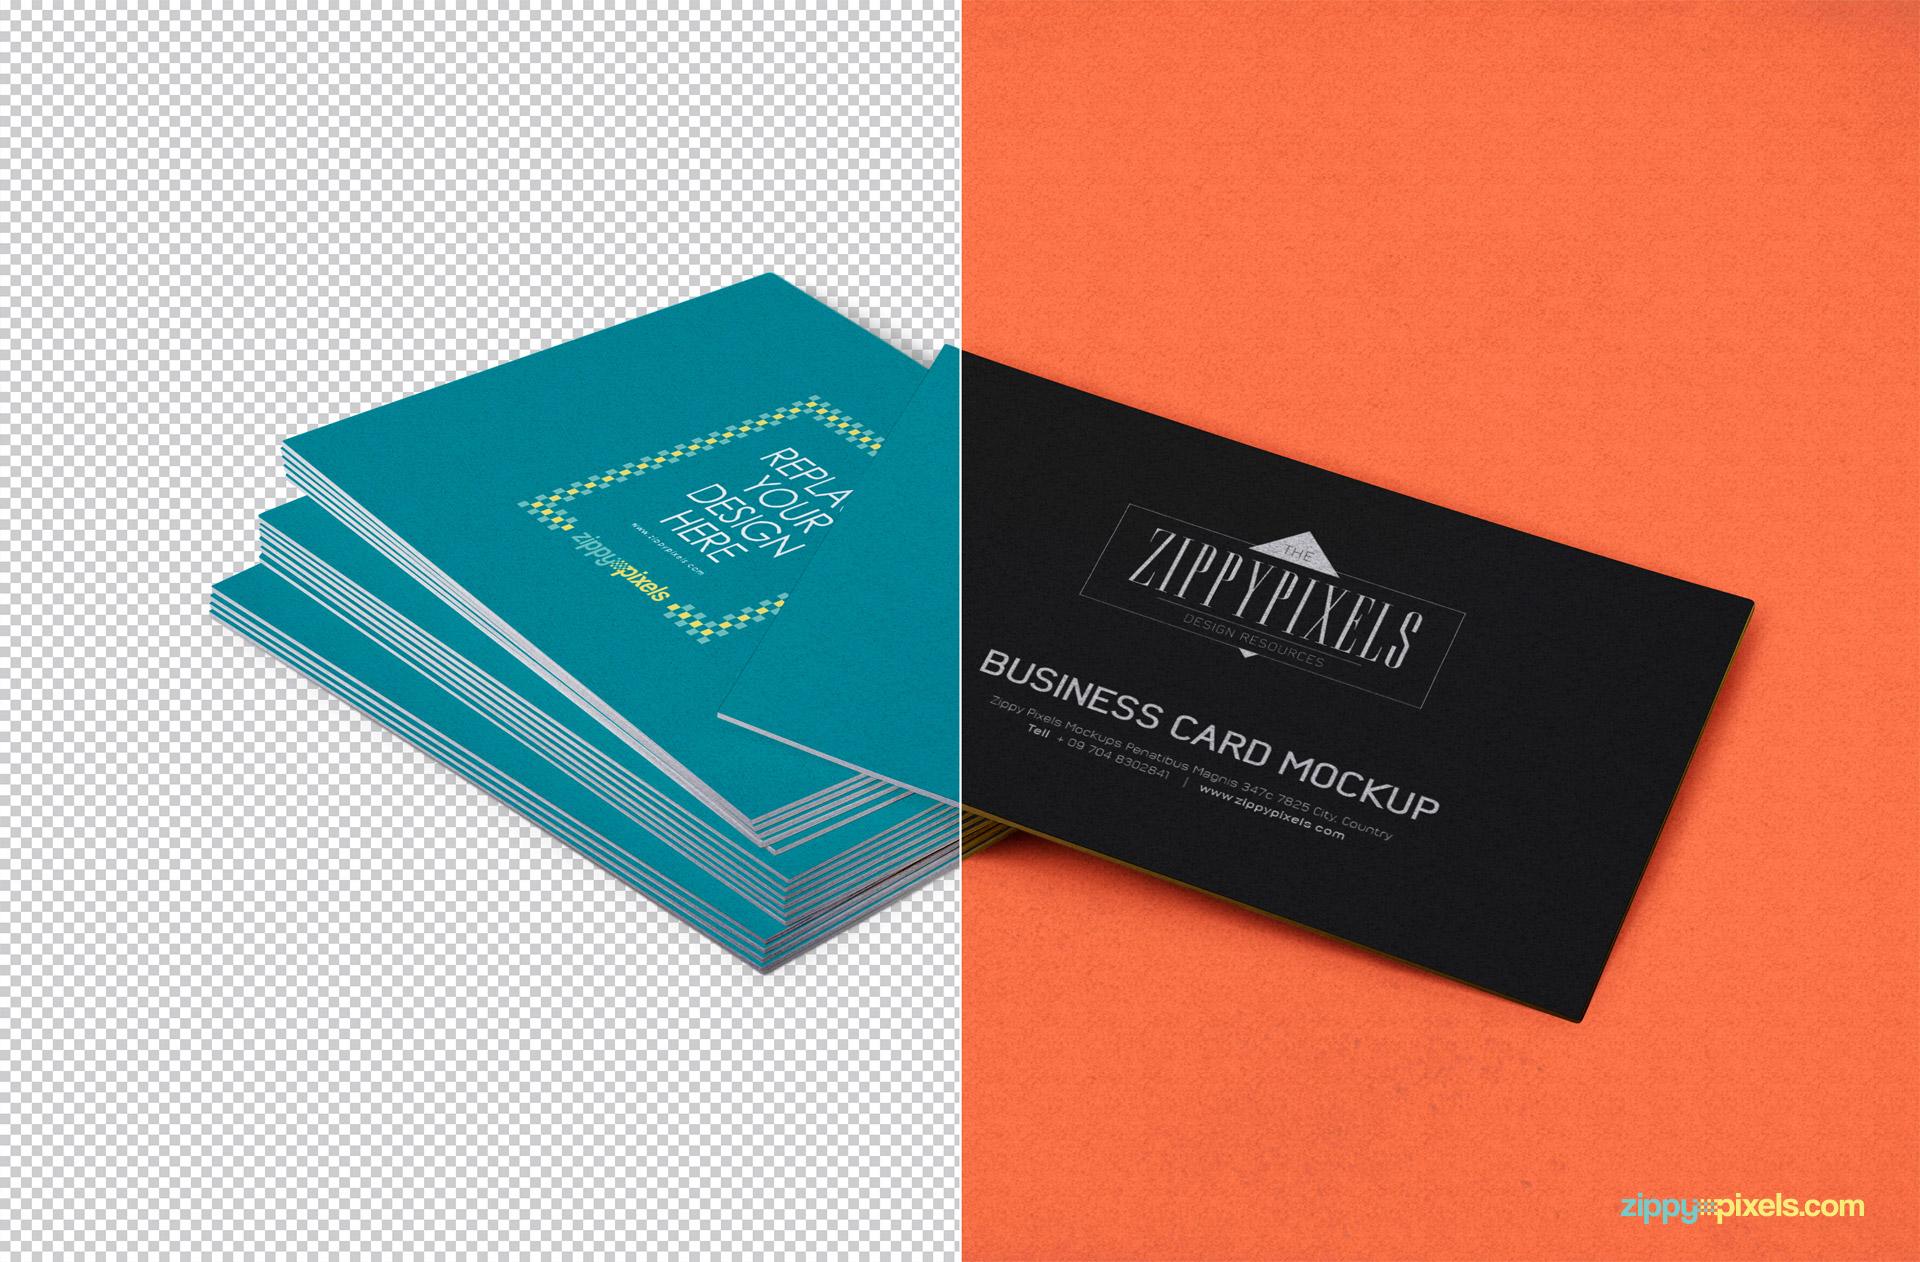 04 Free Editable Business Card Mockup PSD 824x542